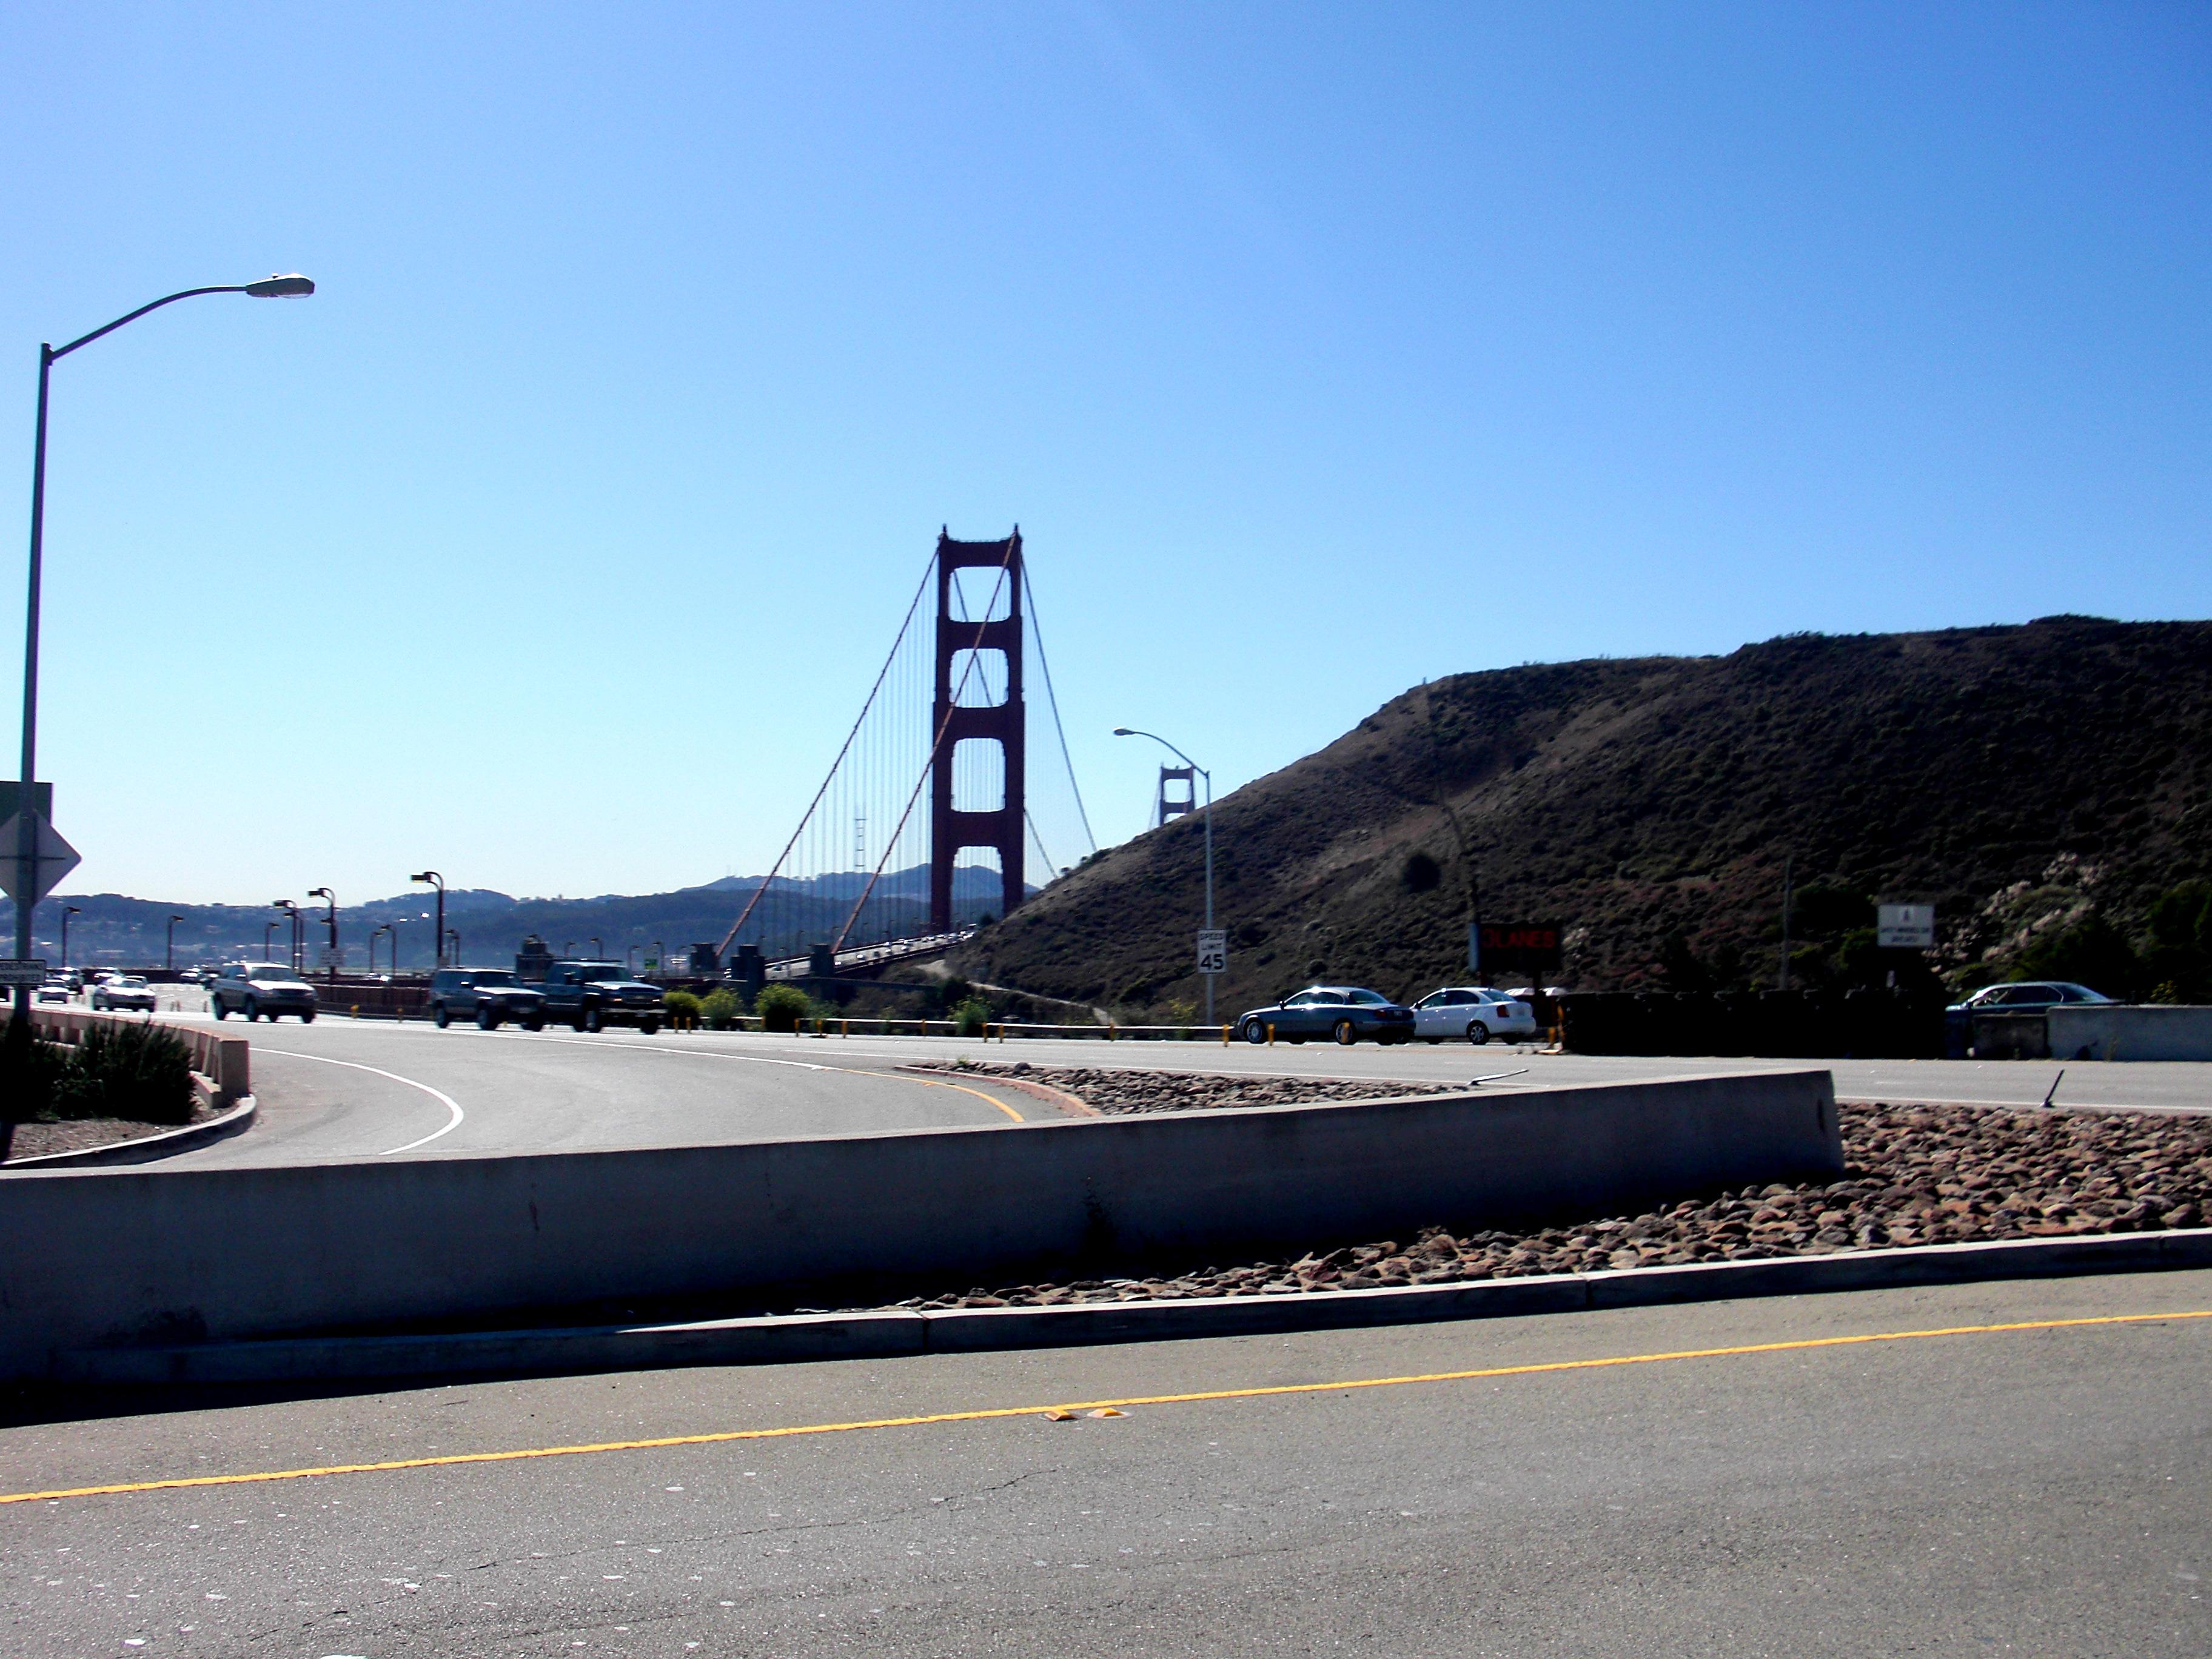 California, Goldengatebridge, Goldengate, Landmark, Famouslandmarks, HQ Photo